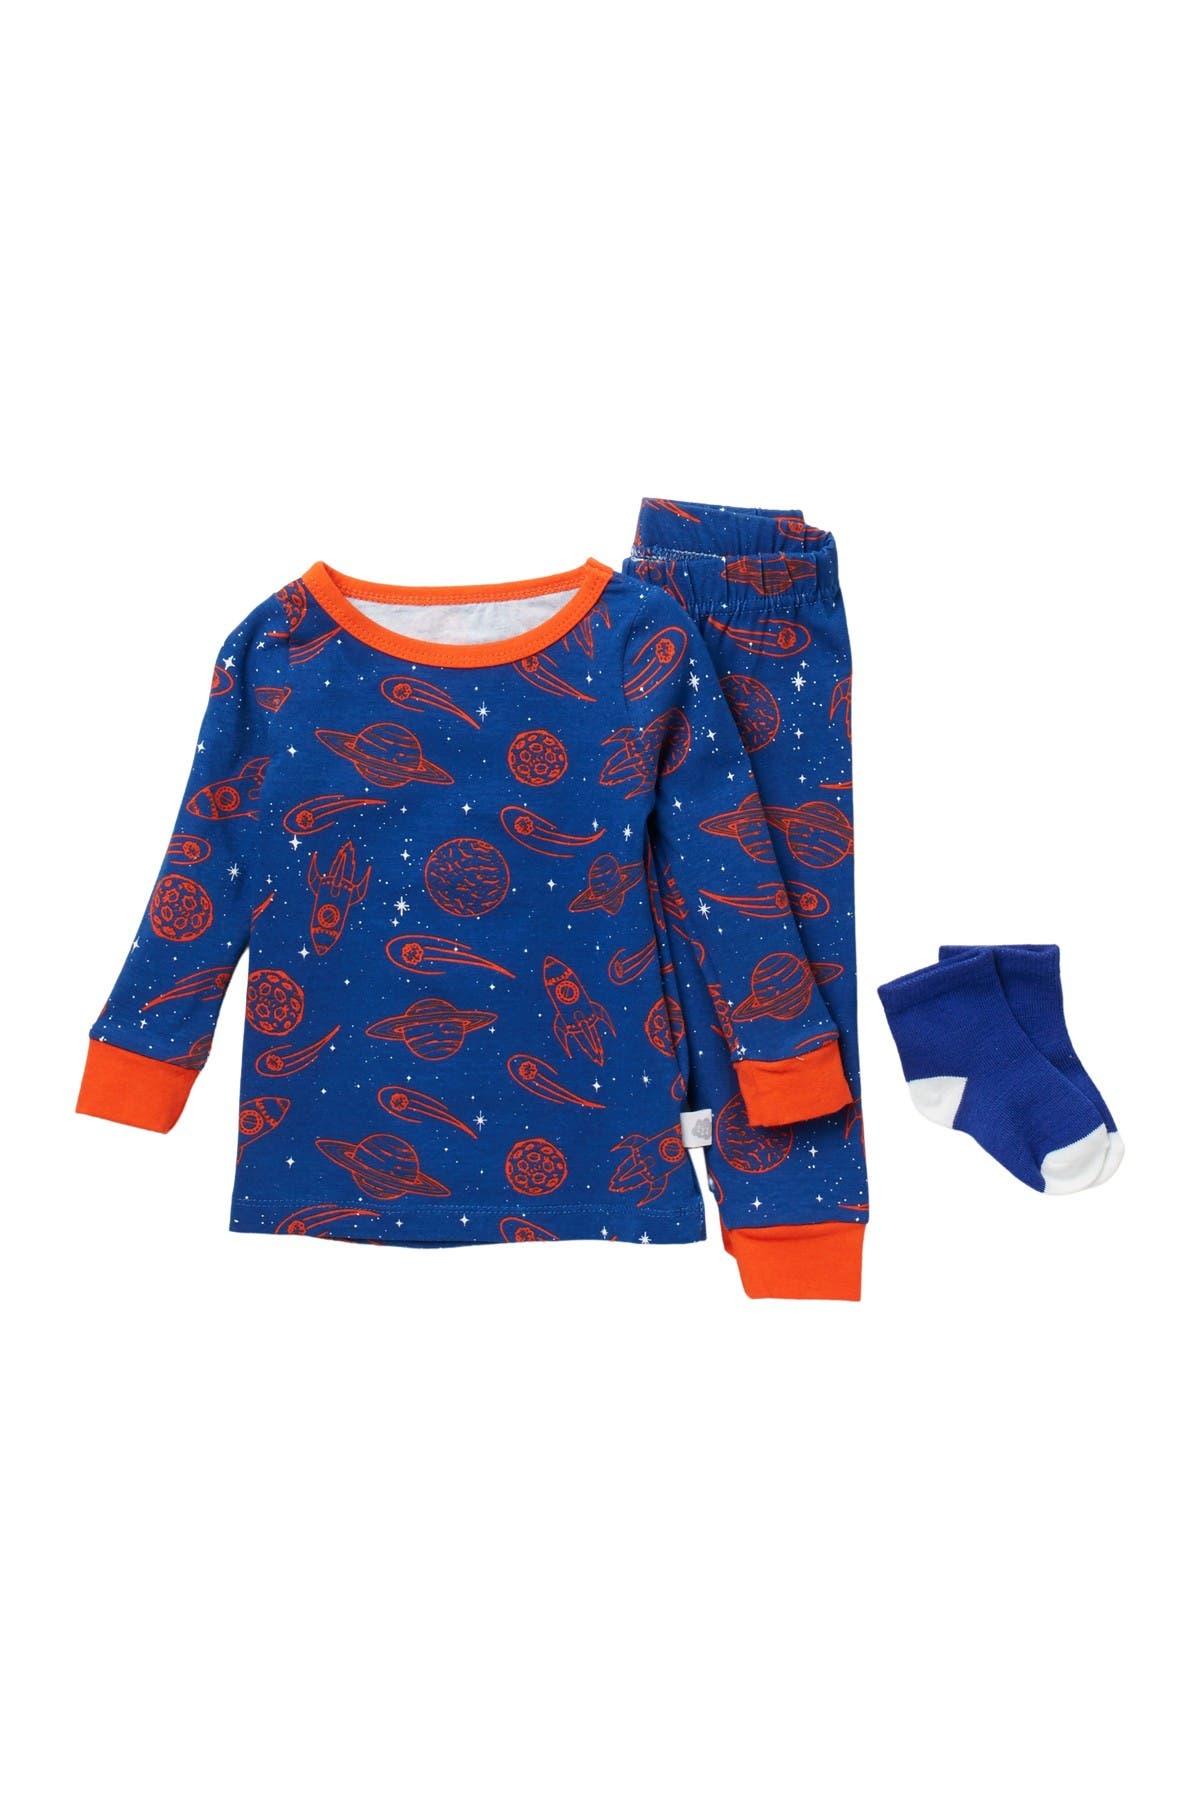 Image of CLOUD NINE 3-Piece Galaxy Pajama Set with Socks